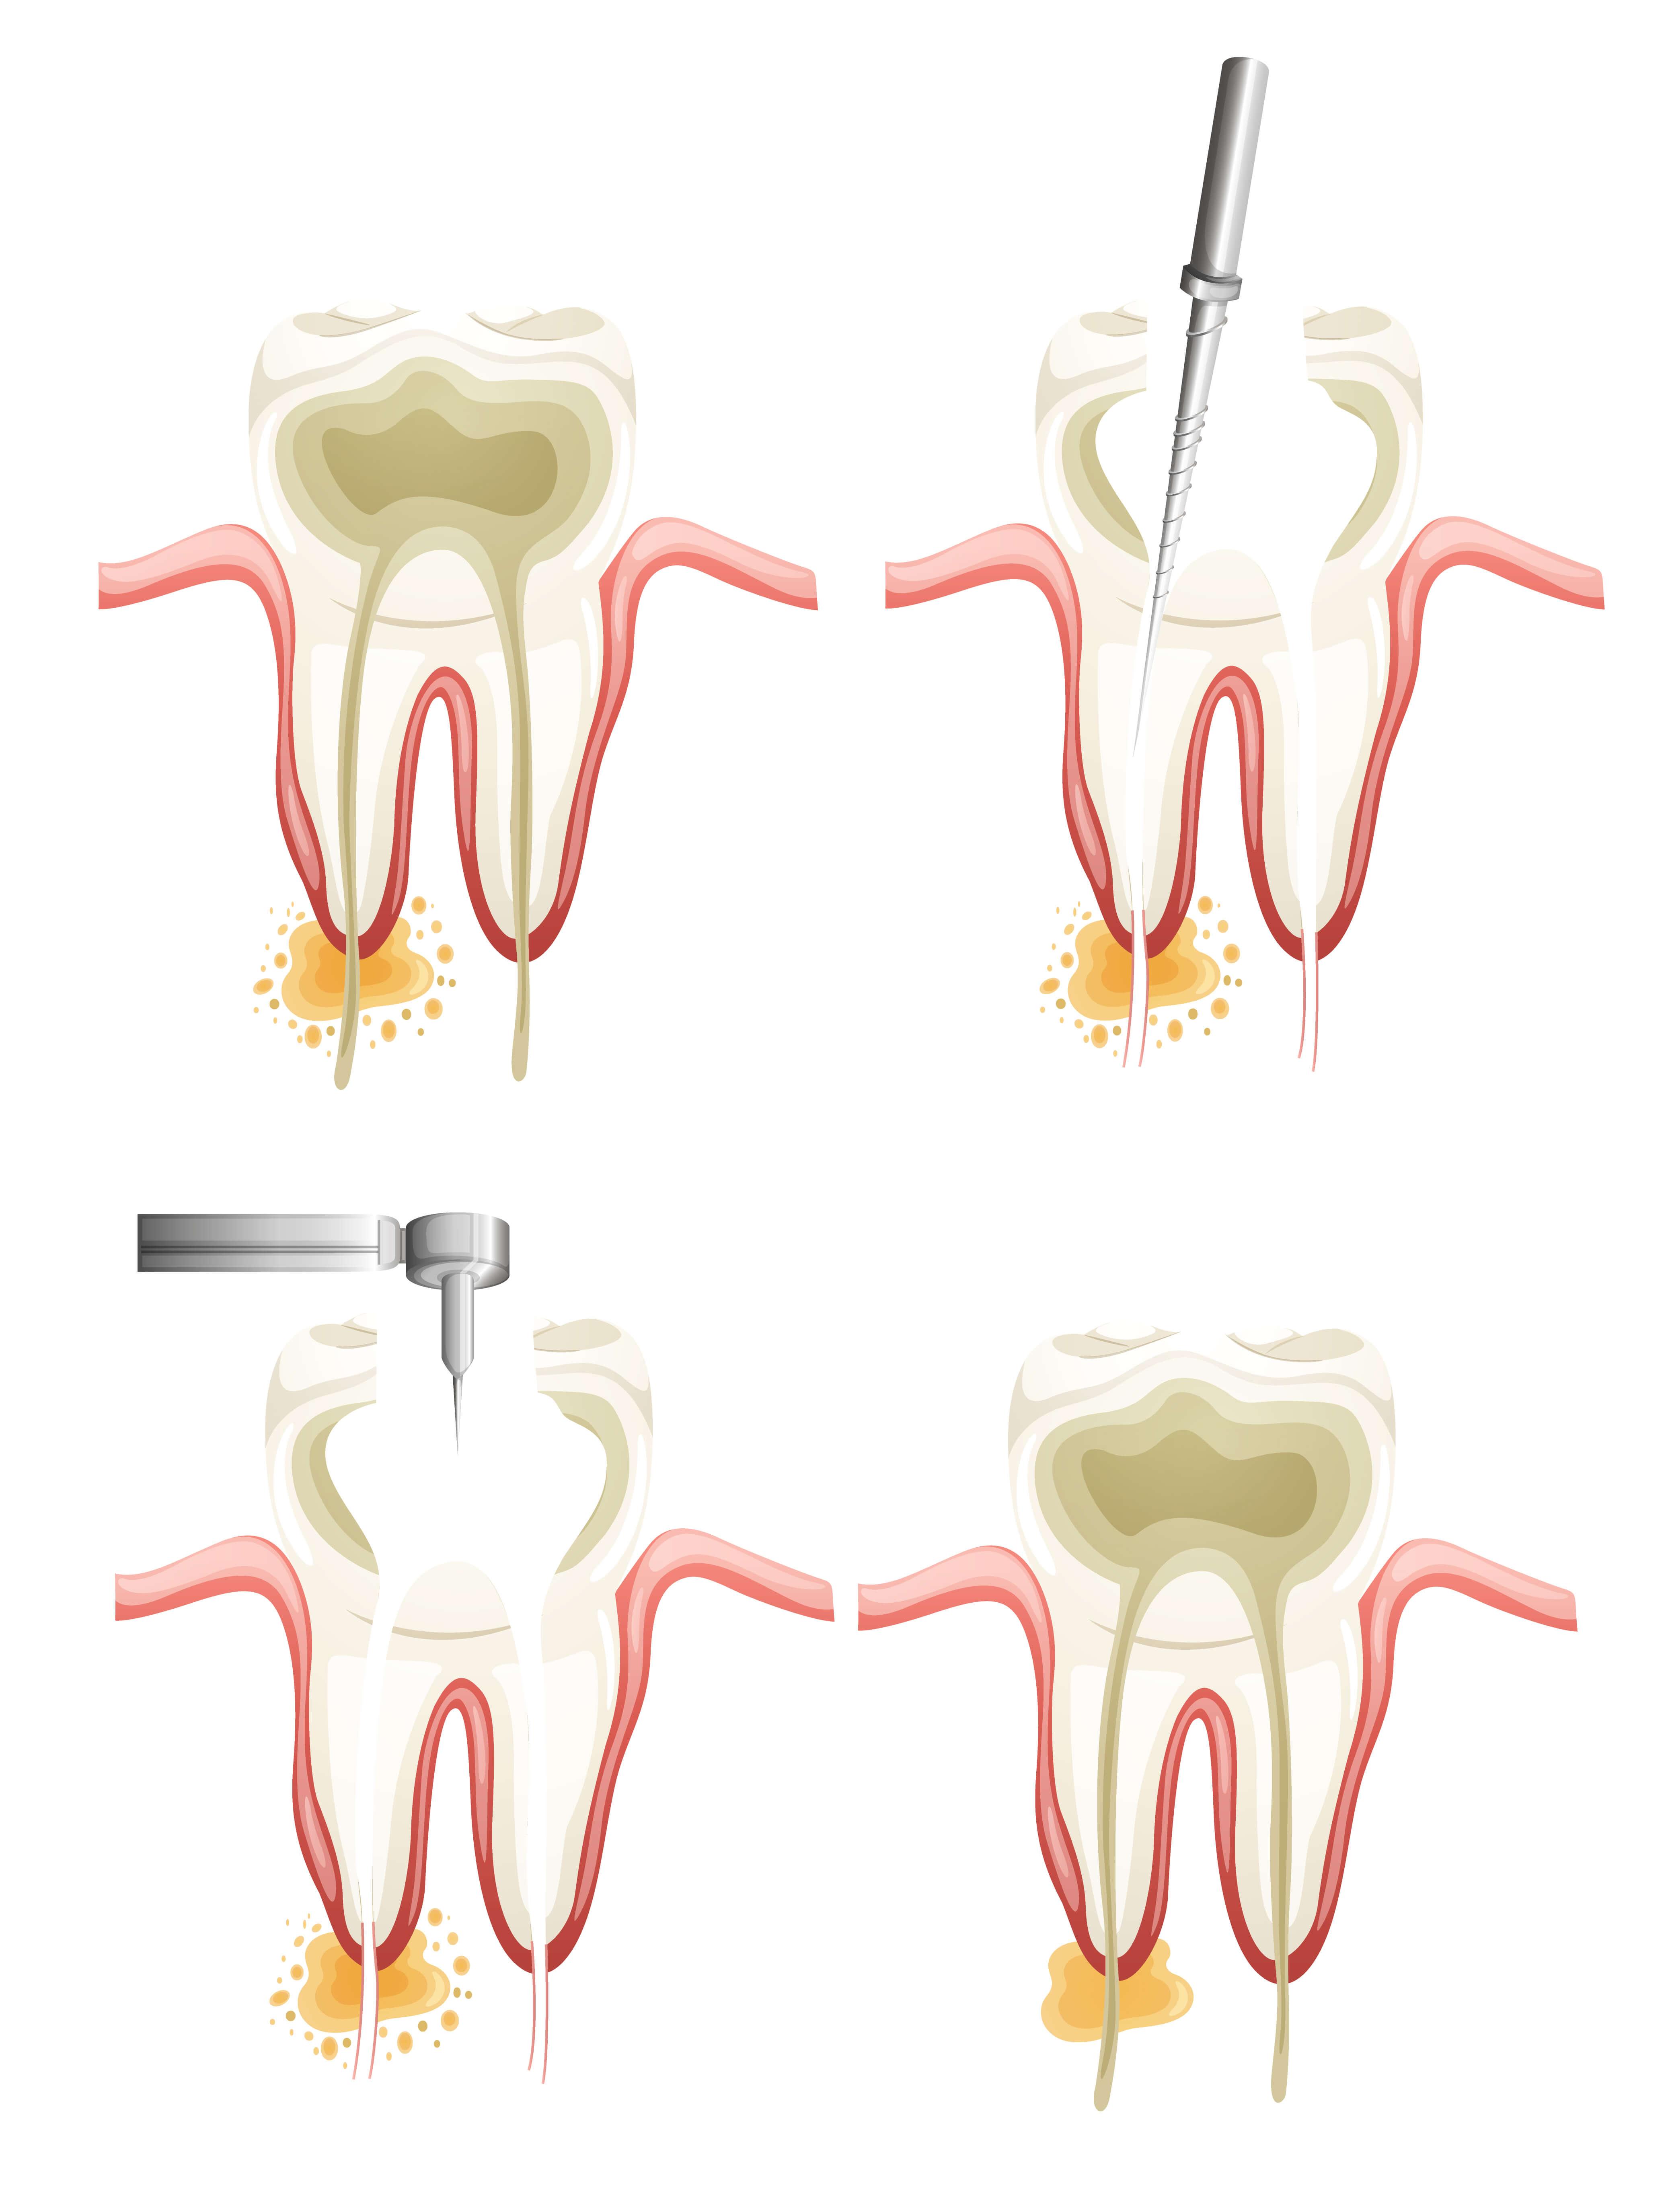 column1-image3